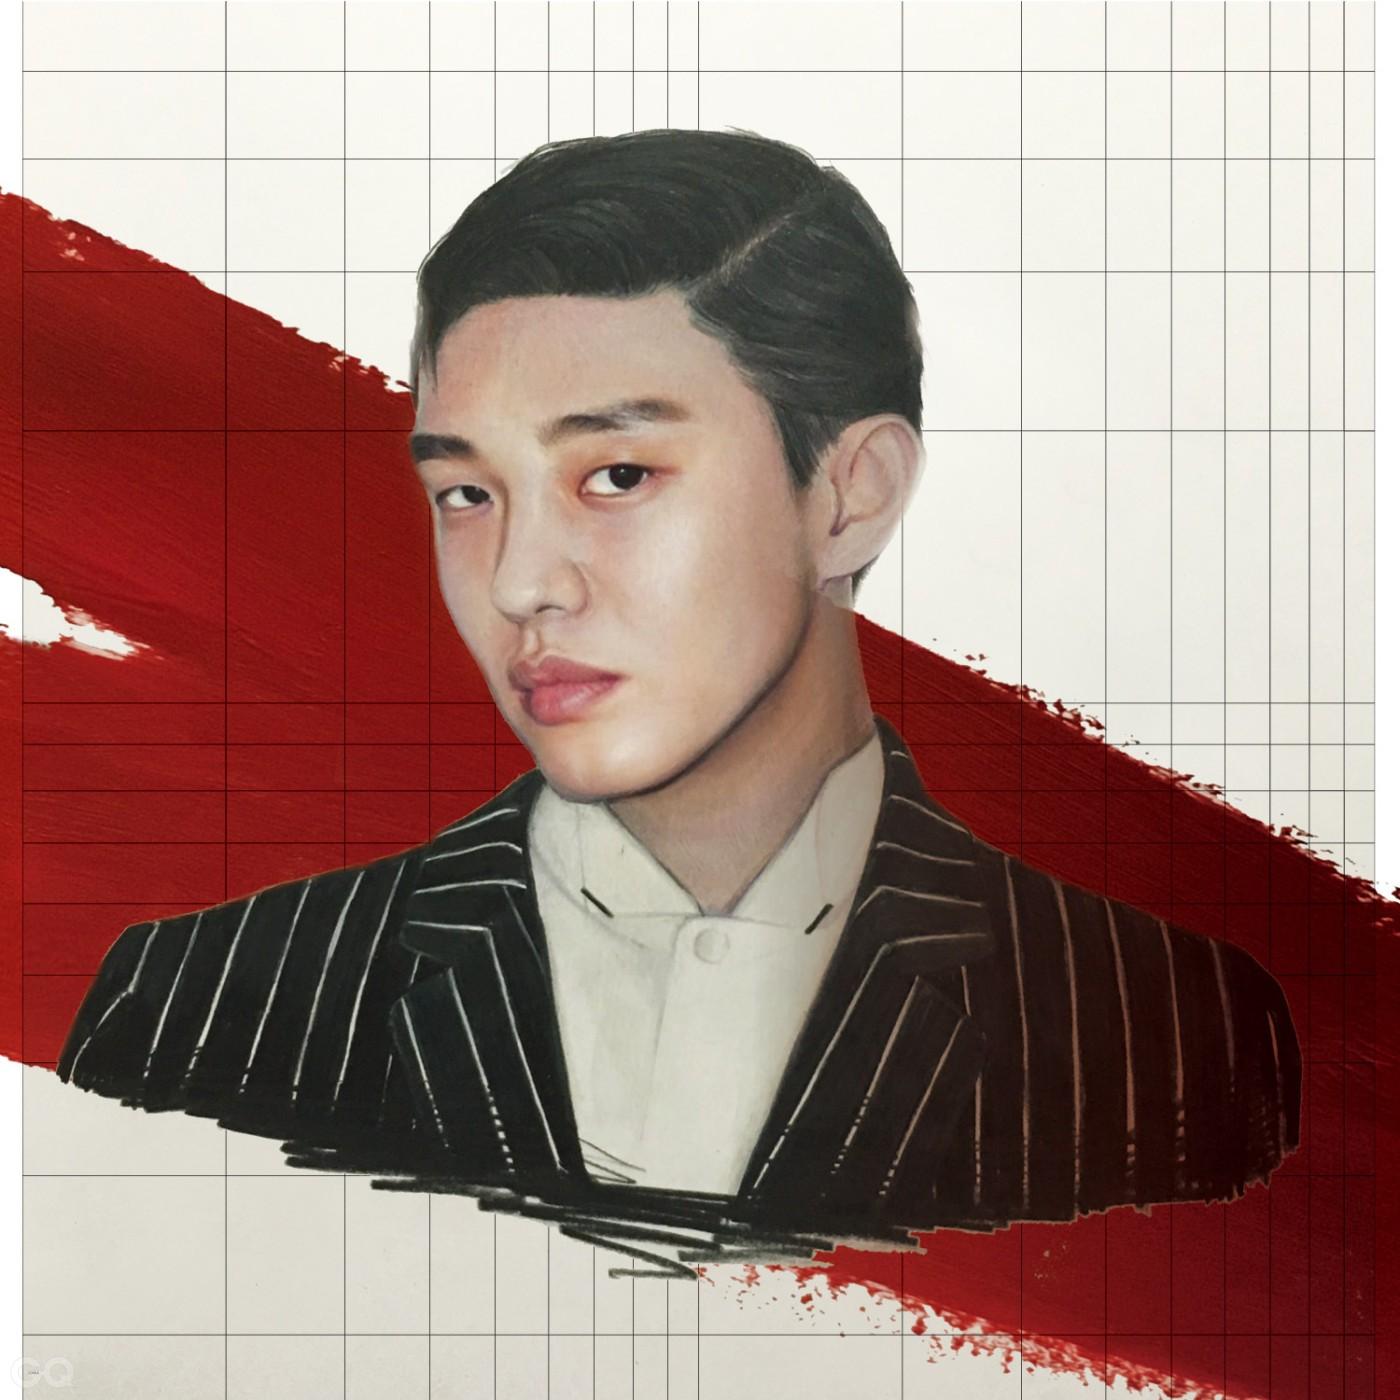 230 GQS_인물론 2-수정-ahin